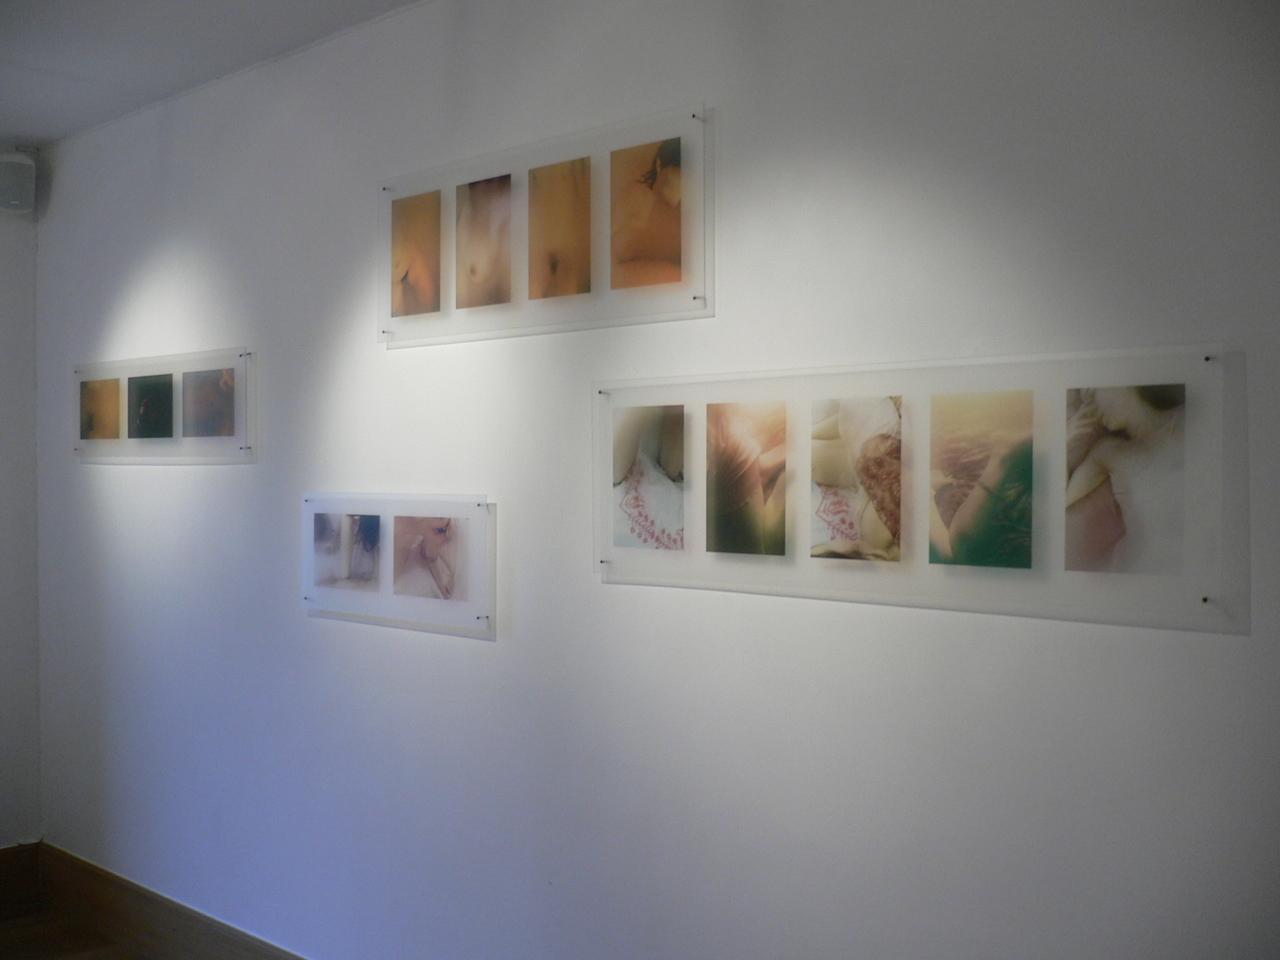 accrochage  Isy Brachot gallerie- Bruxelles-2007-14.JPG